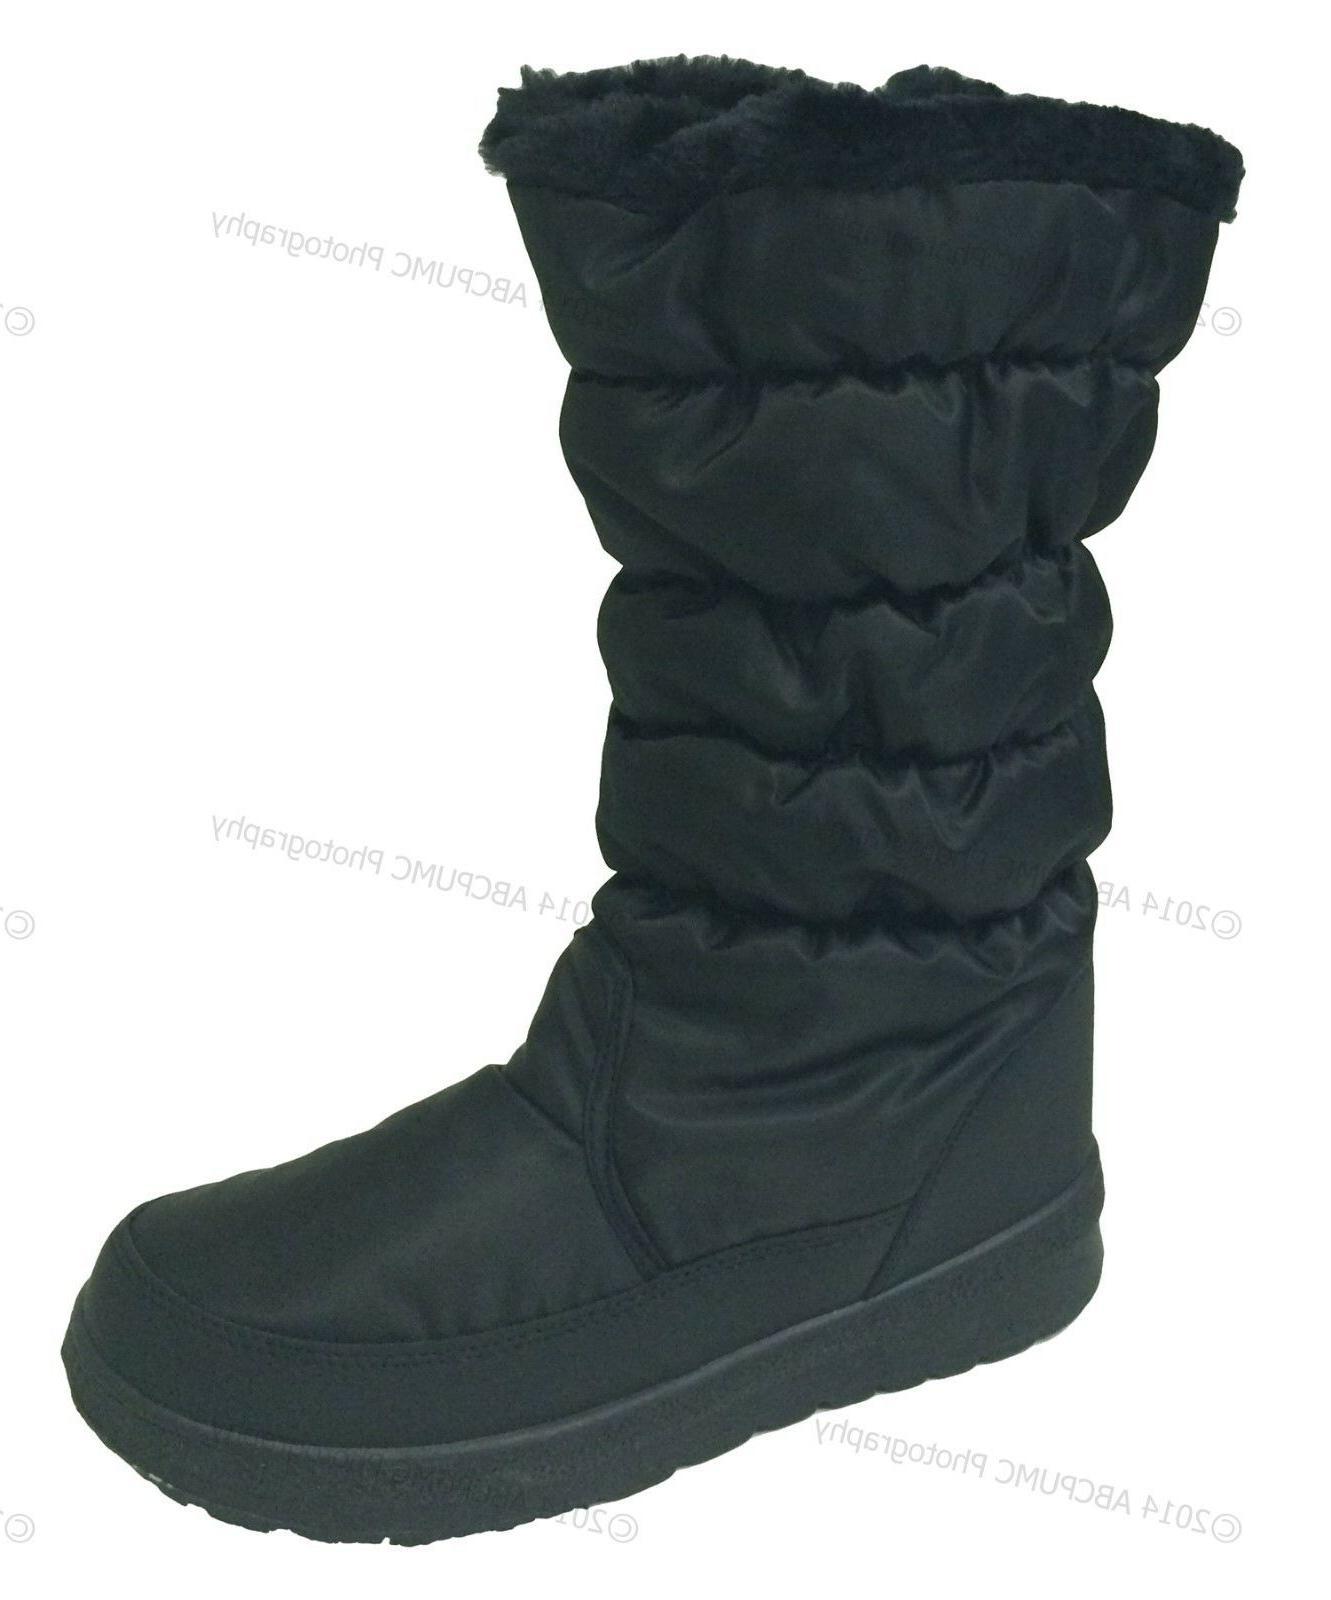 New Fur Lined Zipper Ski Snow Shoes